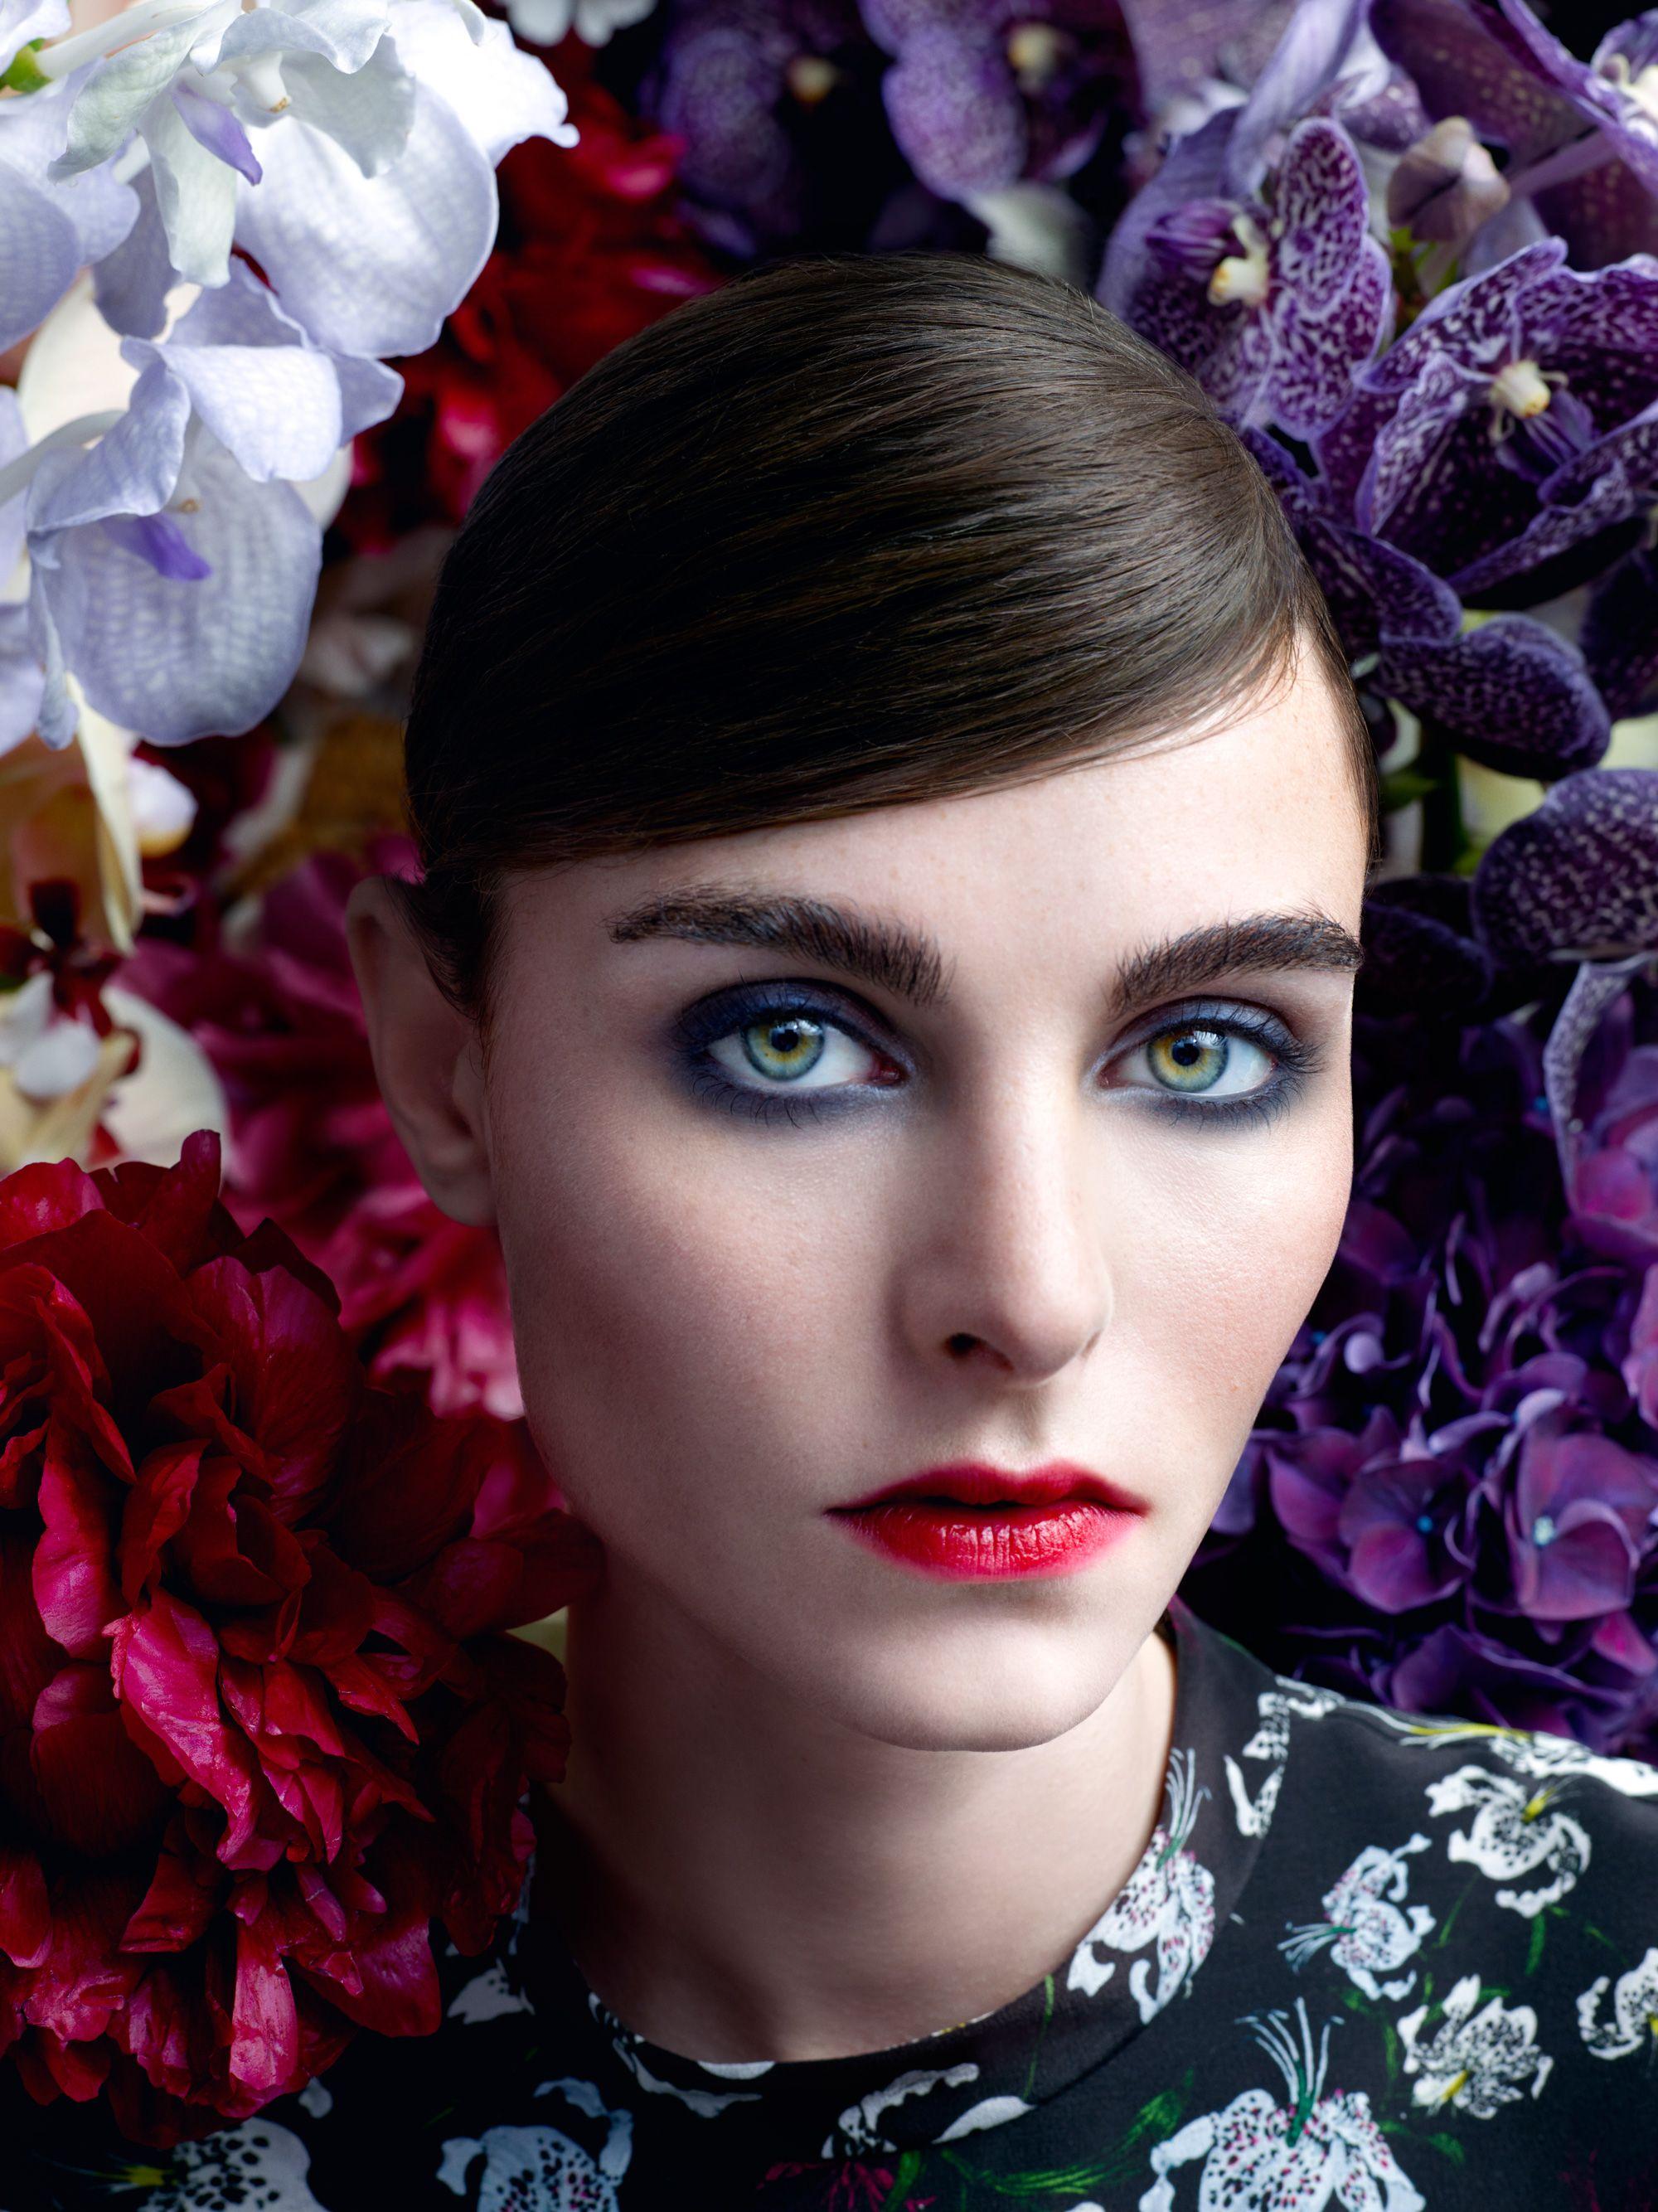 erdem-for-nars-strange-flowers-collection-stylized-image-0